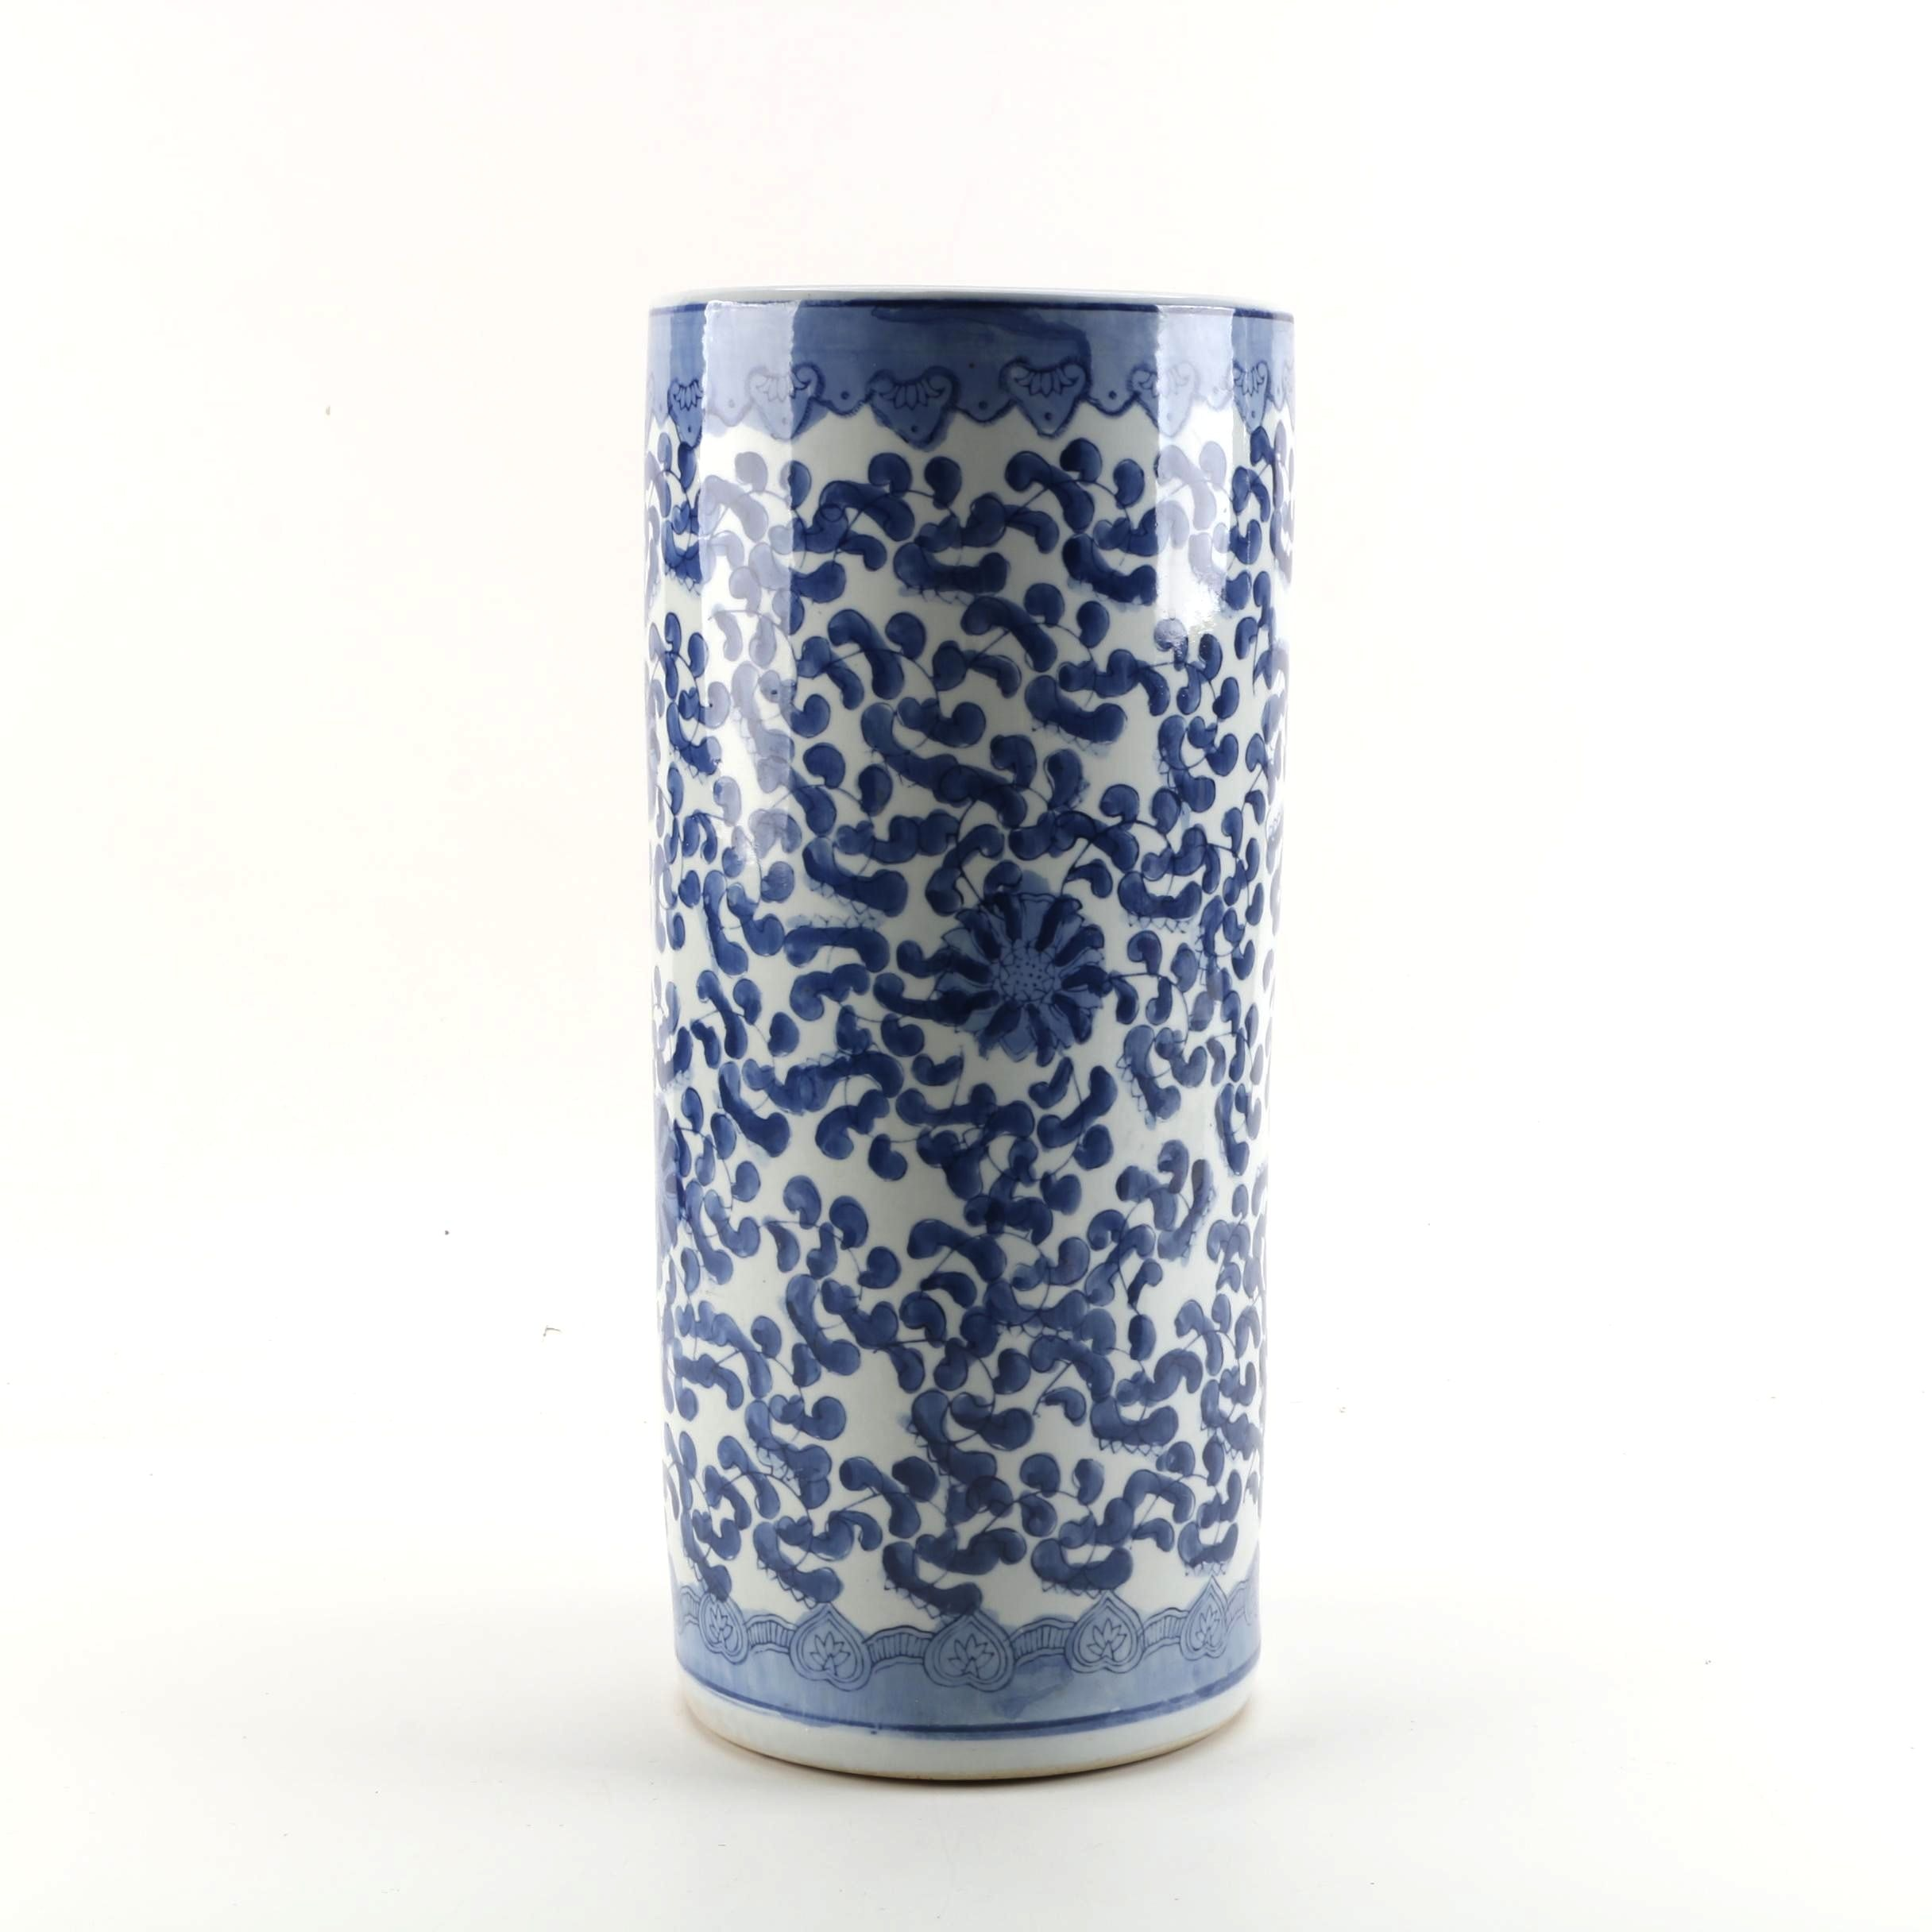 Chinese Blue and White Hand-Painted Ceramic Umbrella Stand